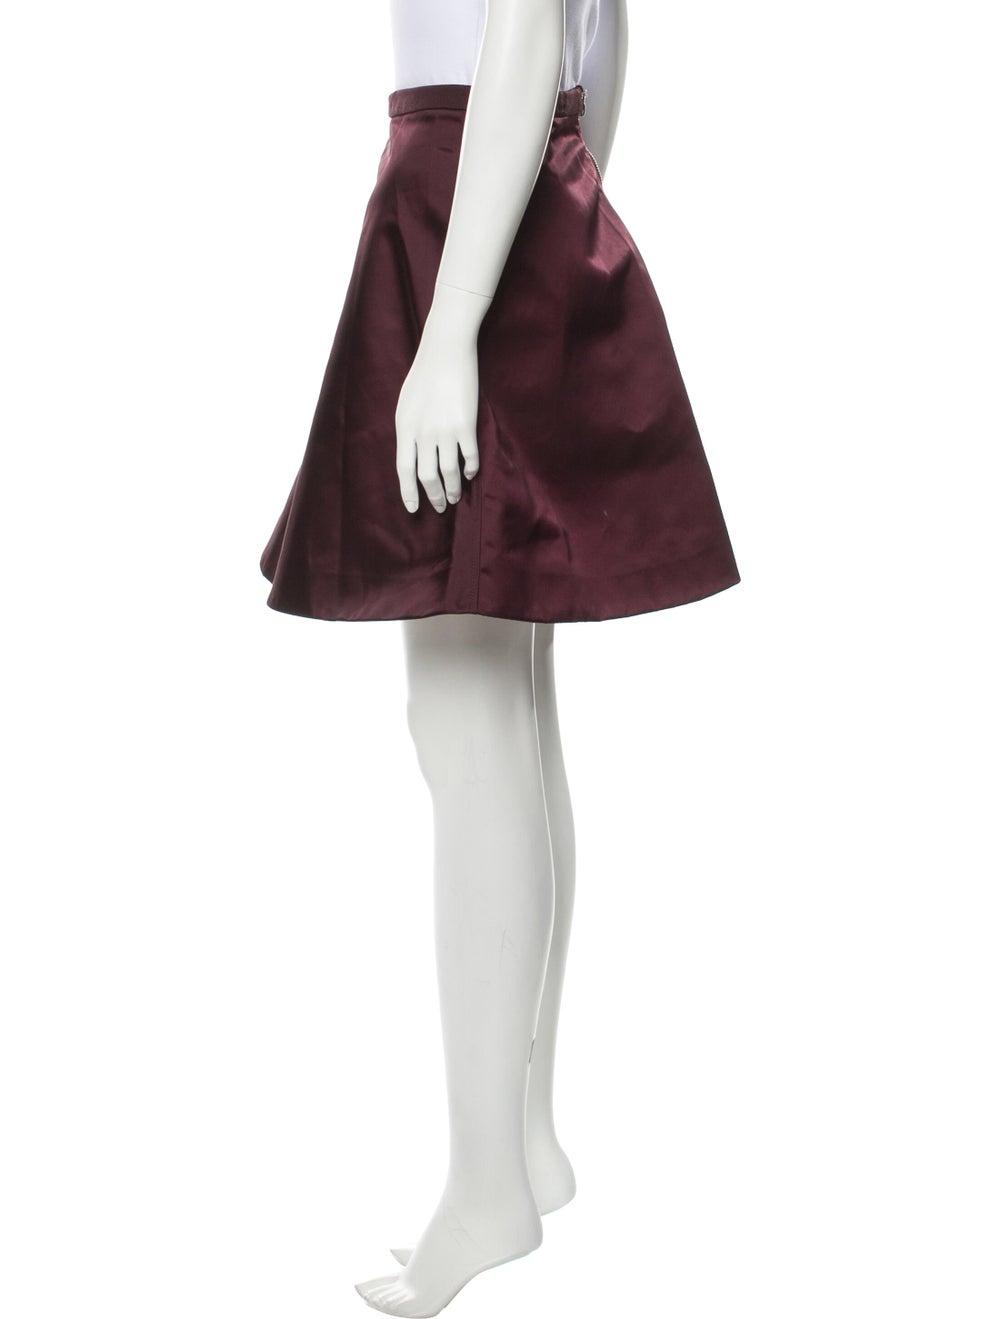 Acne Studios 2015 Mini Skirt - image 2